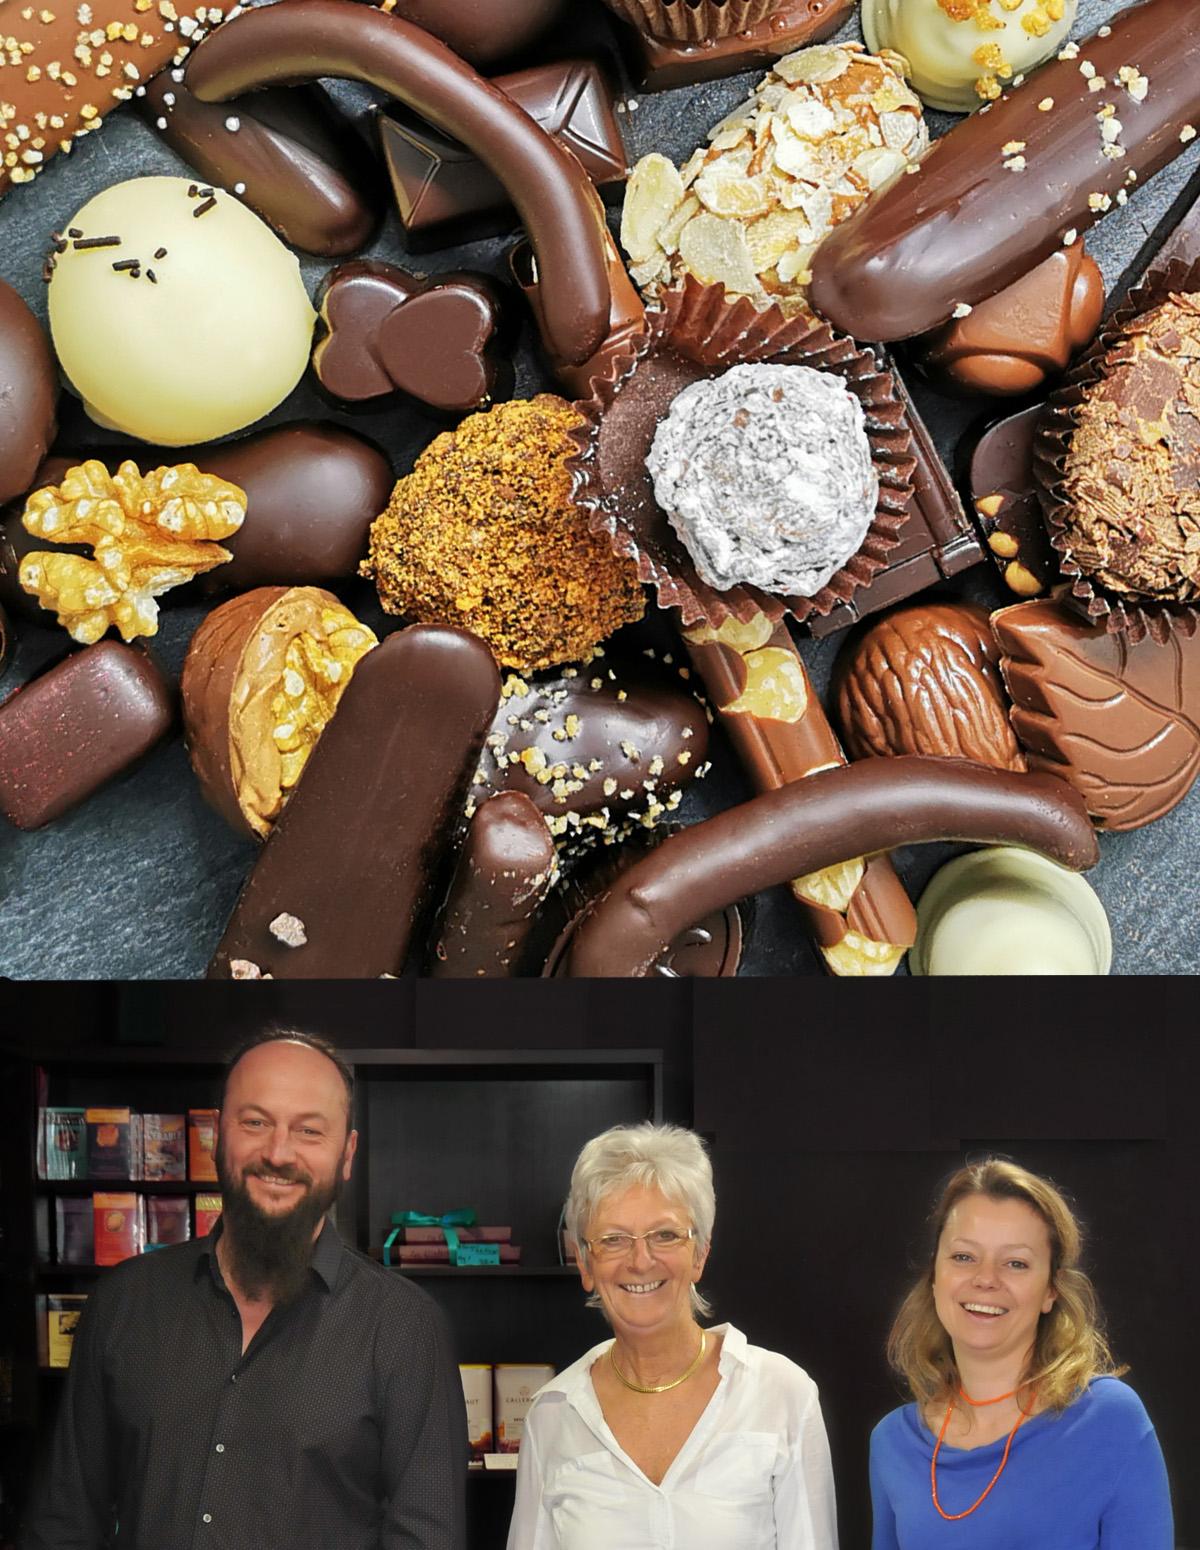 La Cabosse d'Or Chocolatier artisanal